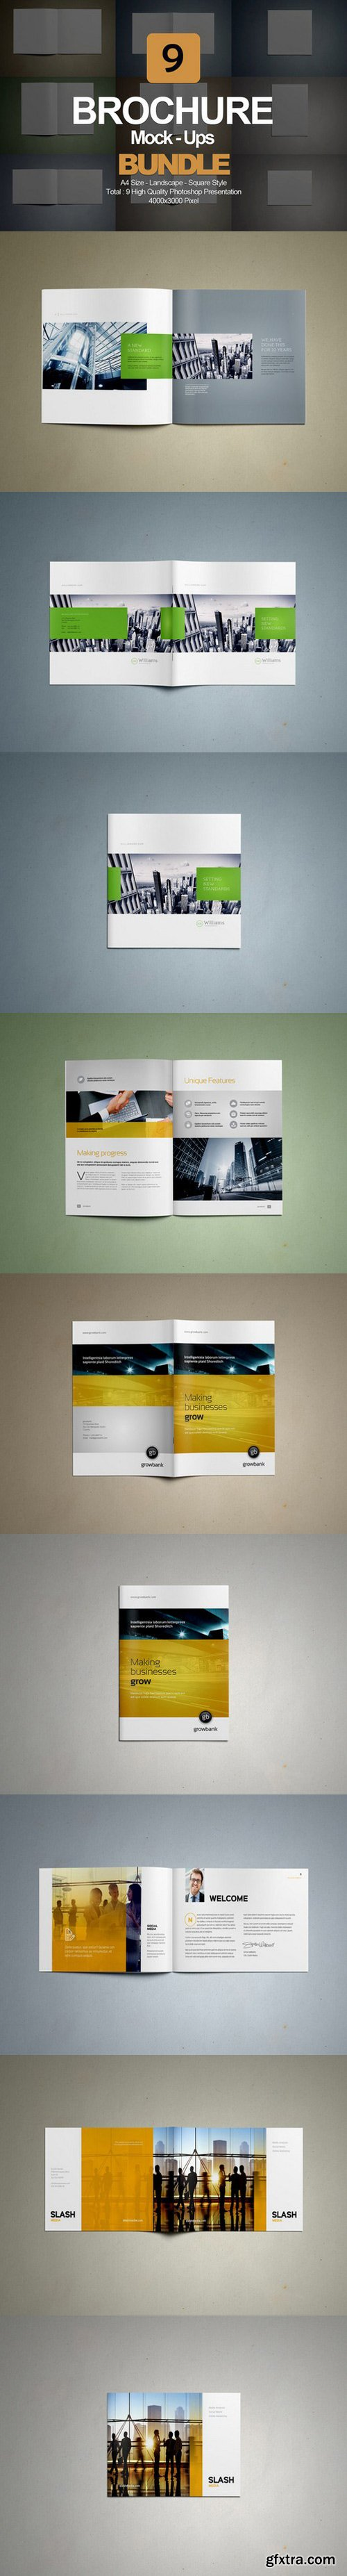 CM - Brochure Mock- Up Bundle 9 in 1 416402